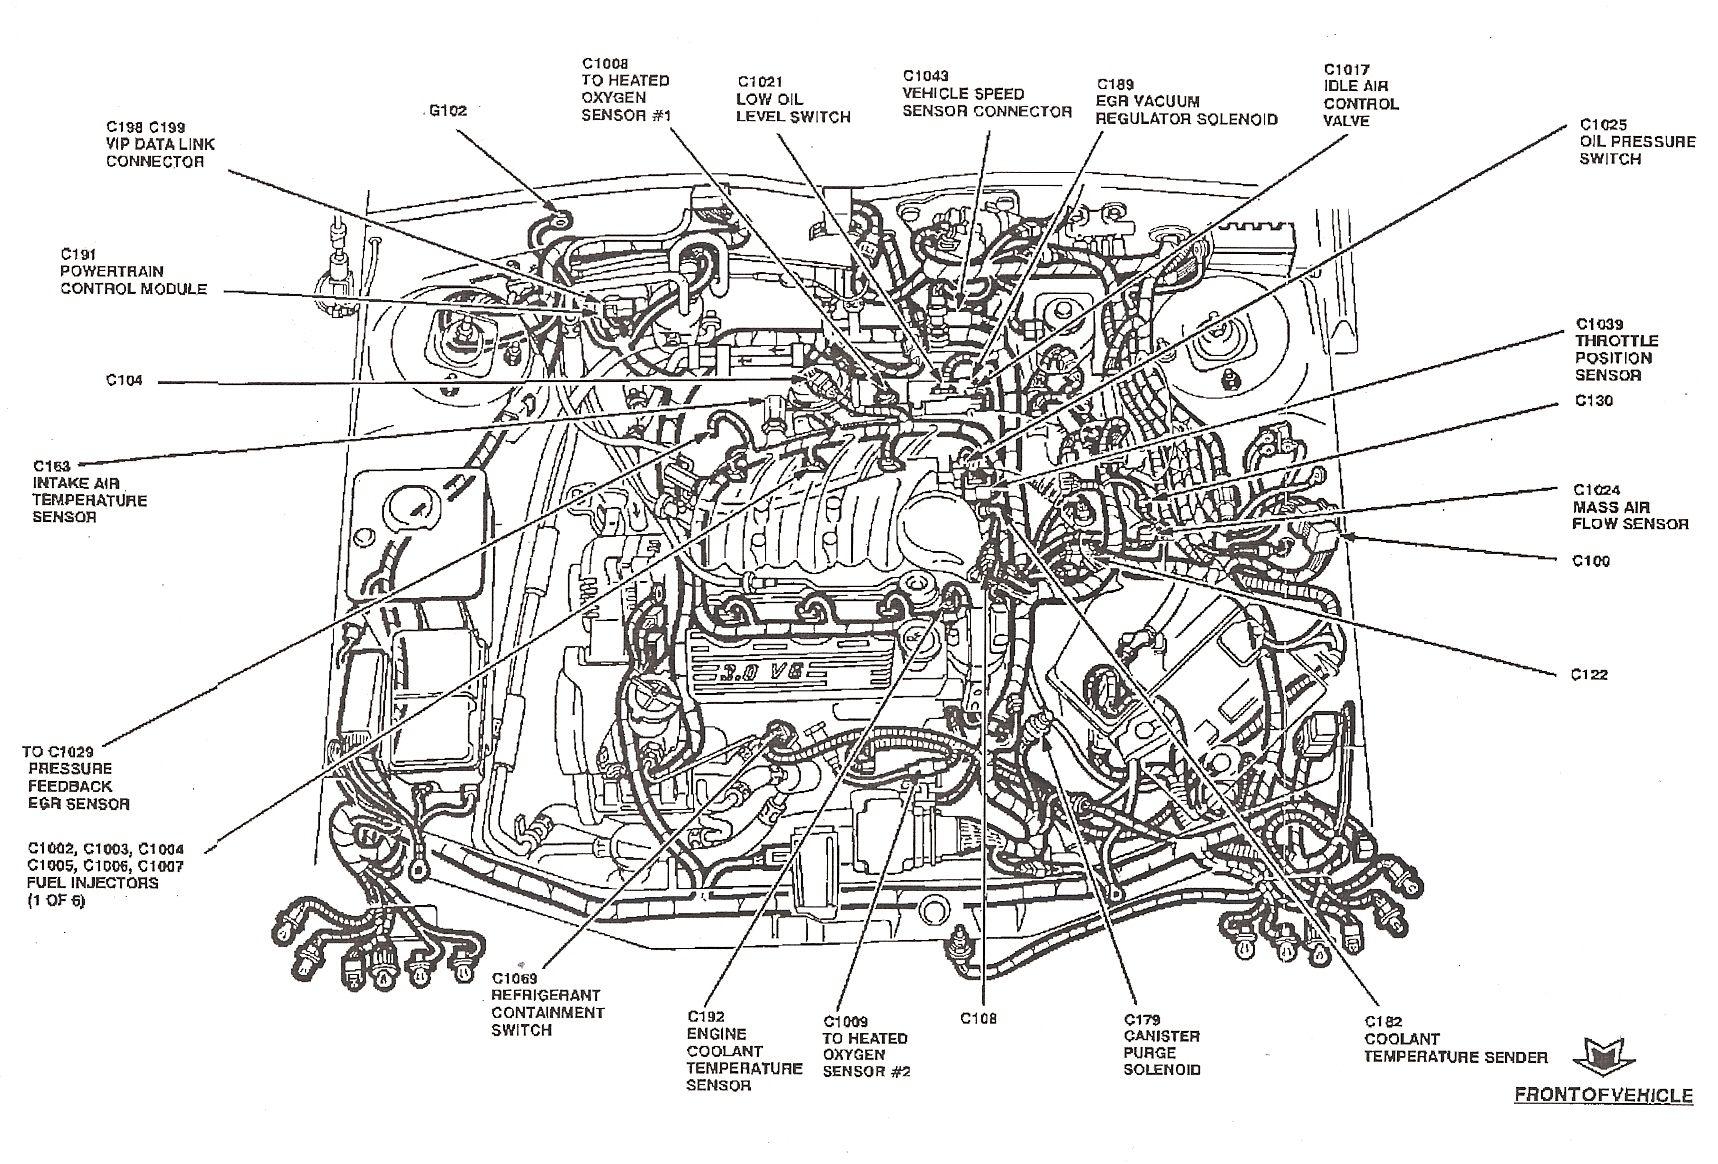 Ford Flex Radio Wiring Diagram Schematics 2010 Stereo Trusted Diagrams Accessories Custom